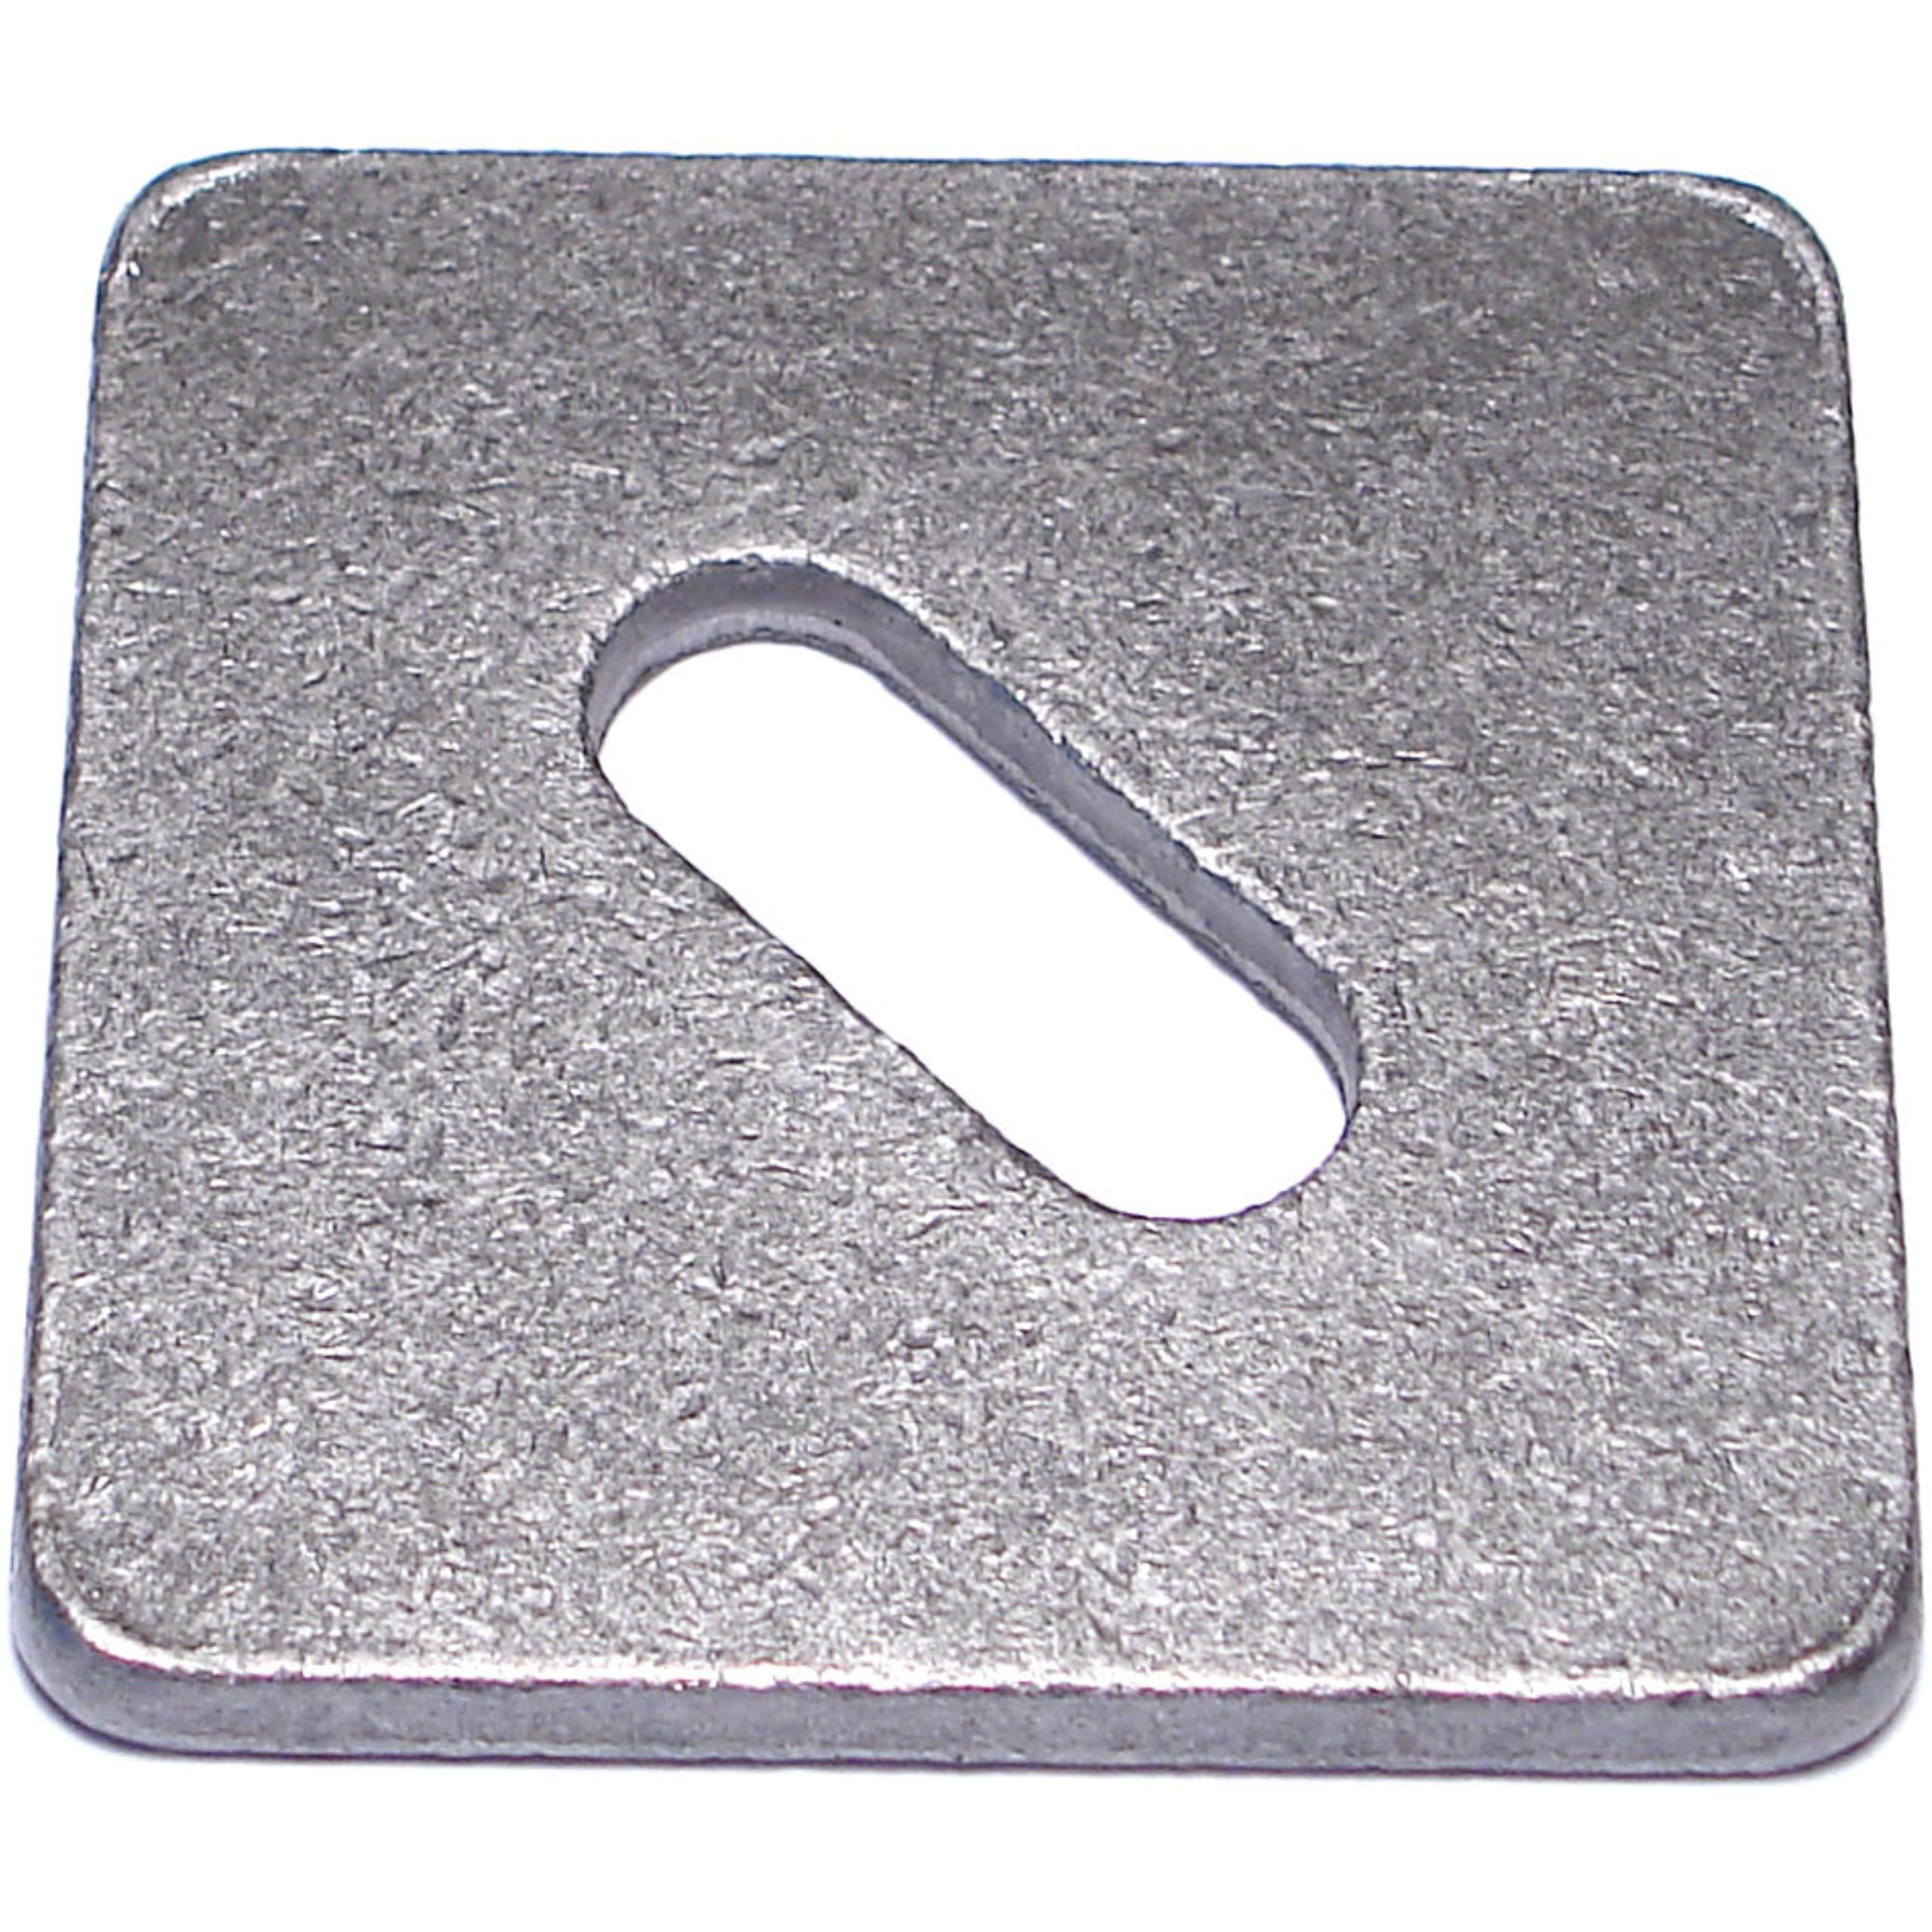 Hard-to-Find Fastener 014973174699 EQ Code Square Washers, 1/2 x 3x3 x1/4, Piece-16 by Hard-to-Find Fastener